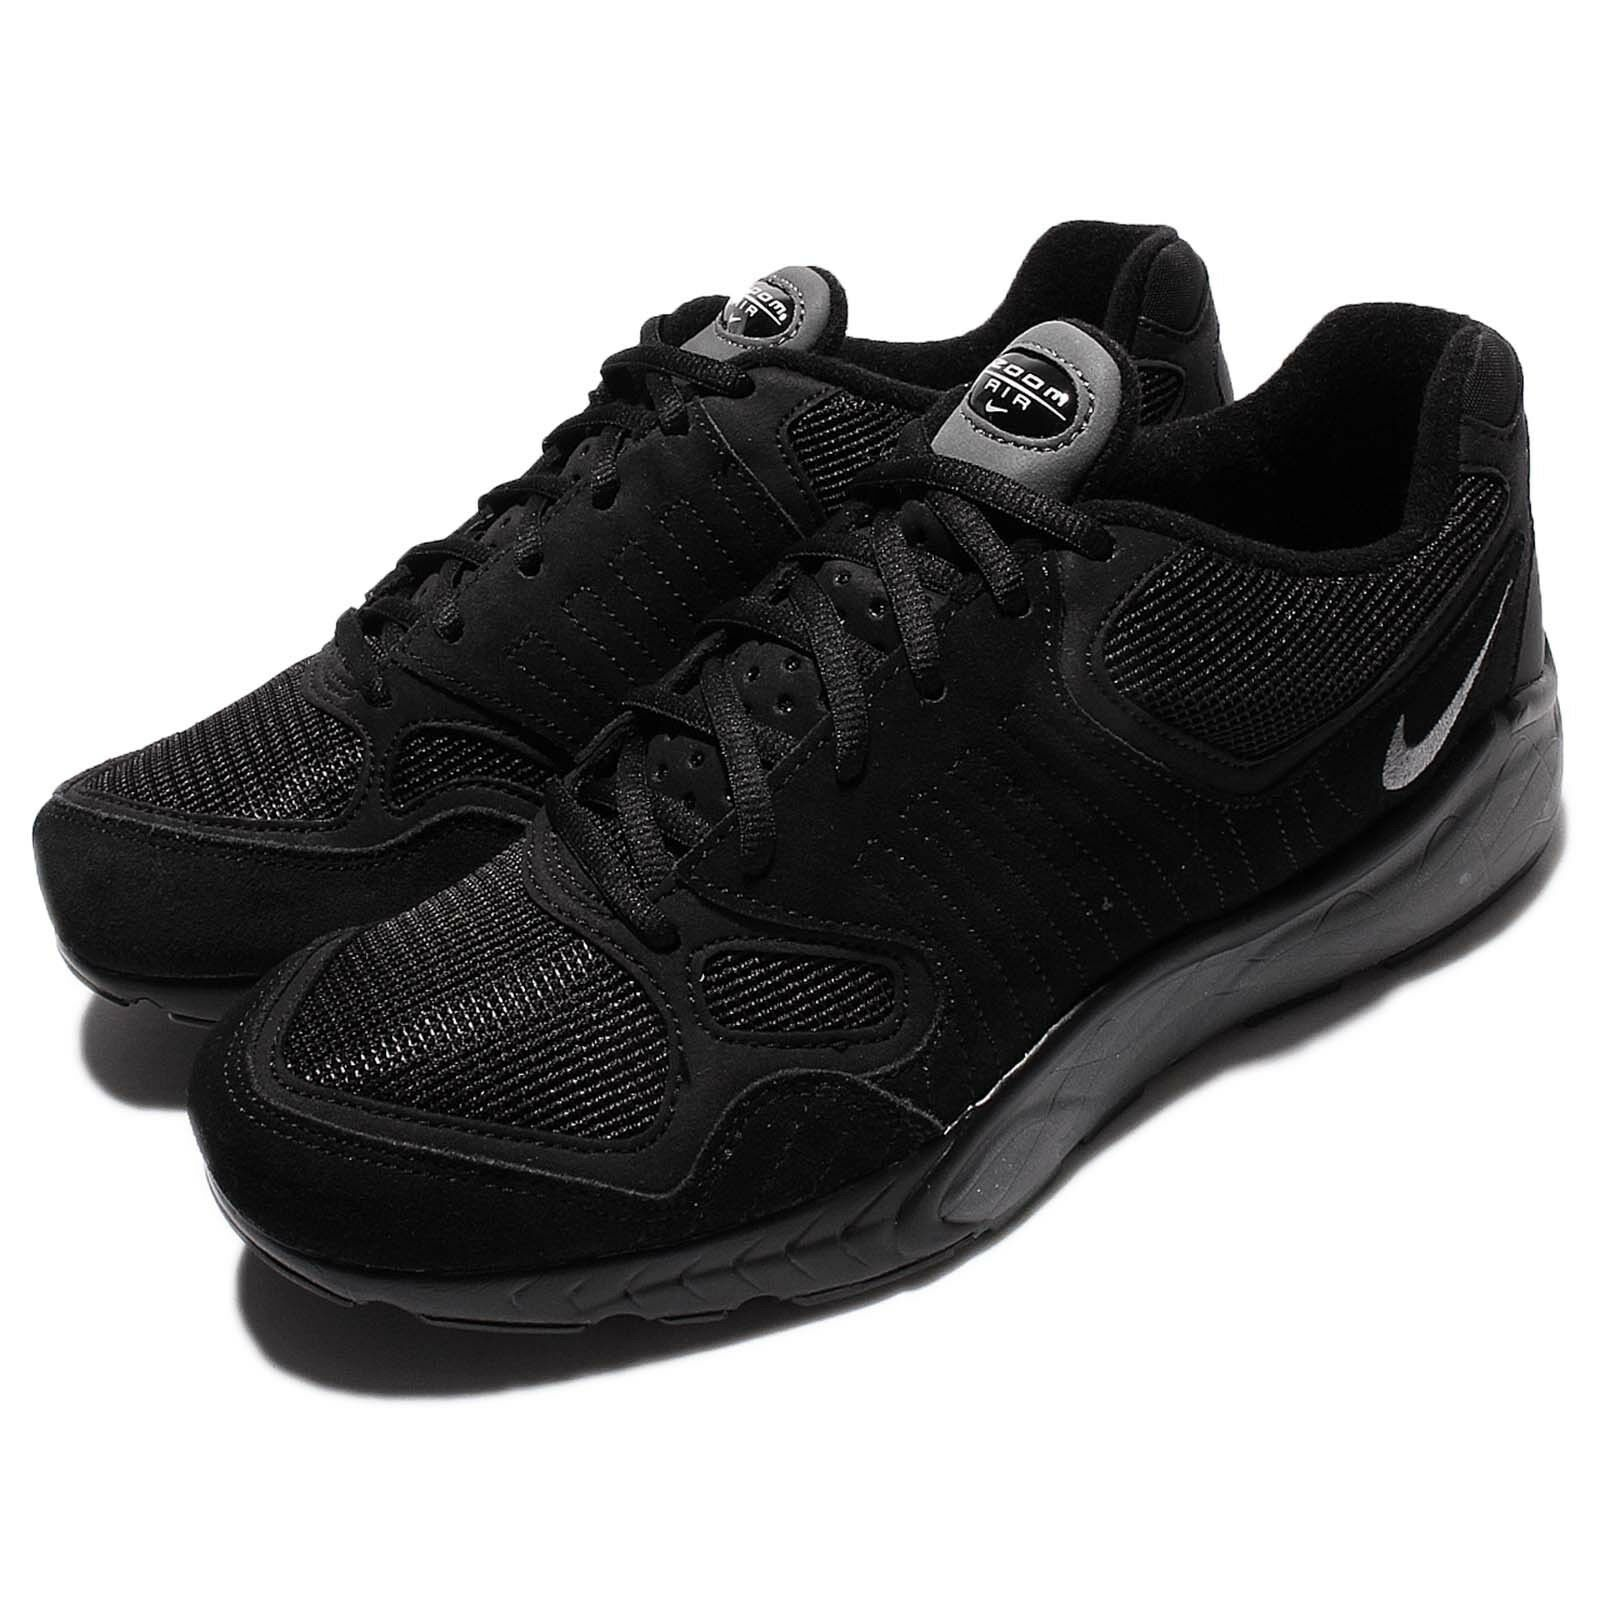 Nike Air Zoom Talaria 16 Black Sneakers Grey Men Running Shoes Sneakers Black 844695-002 ec7310